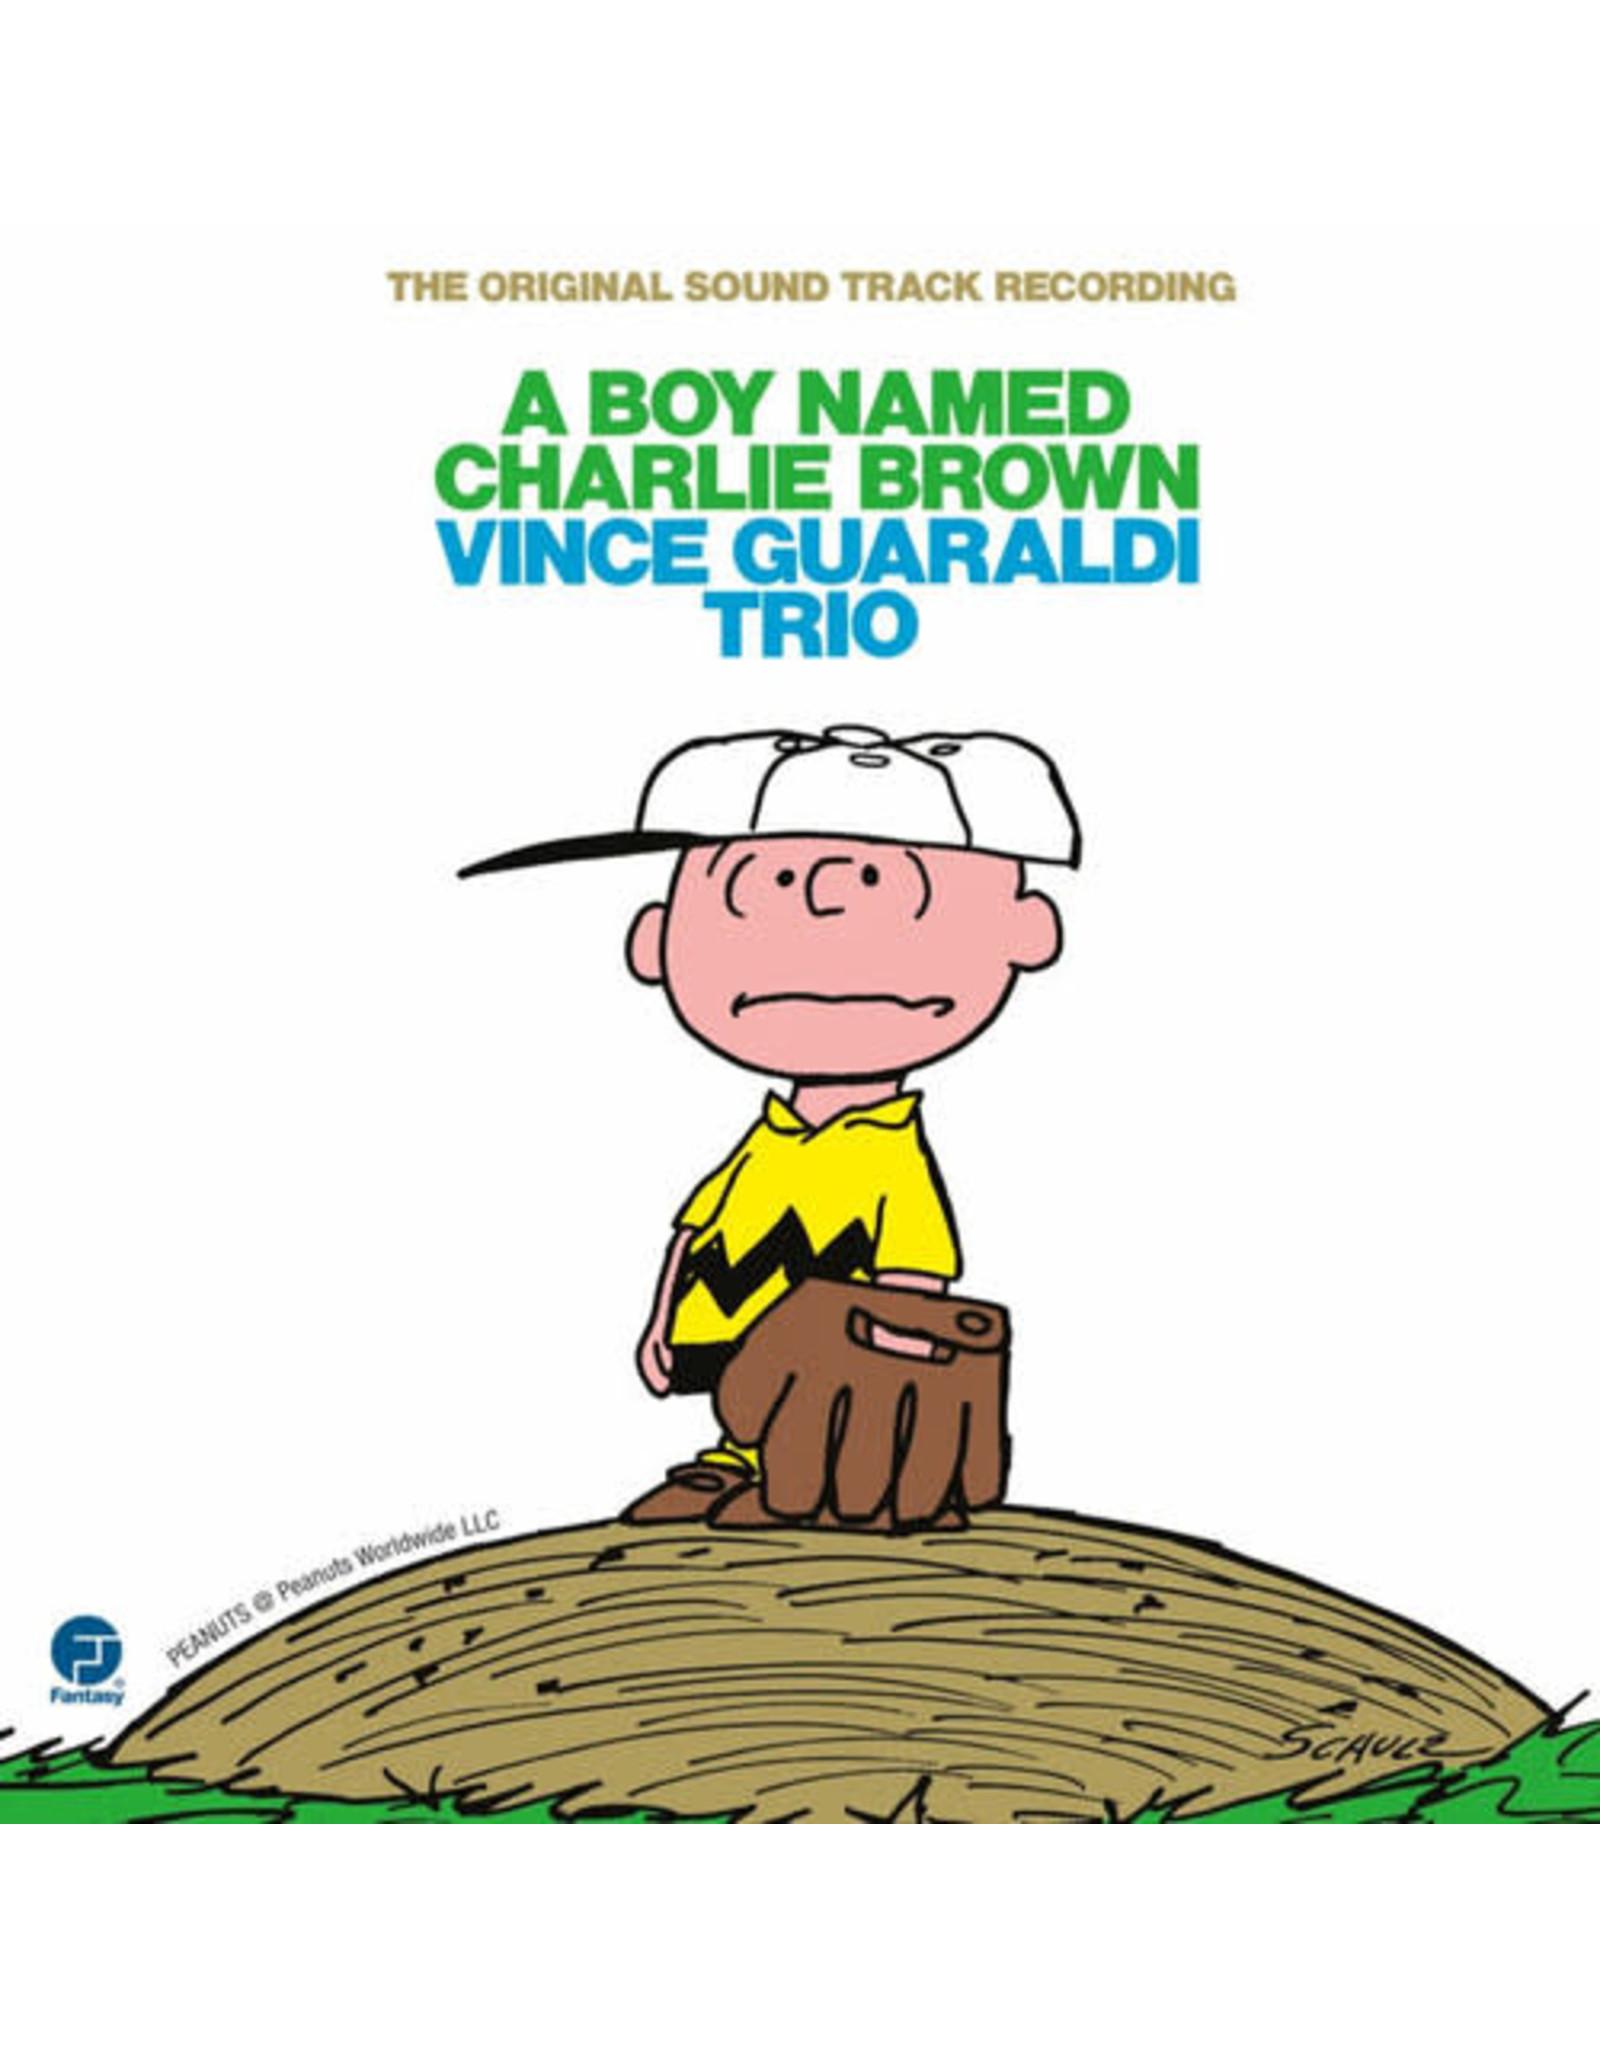 New Vinyl Vince Guaraldi Trio - A Boy Named Charlie Brown LP